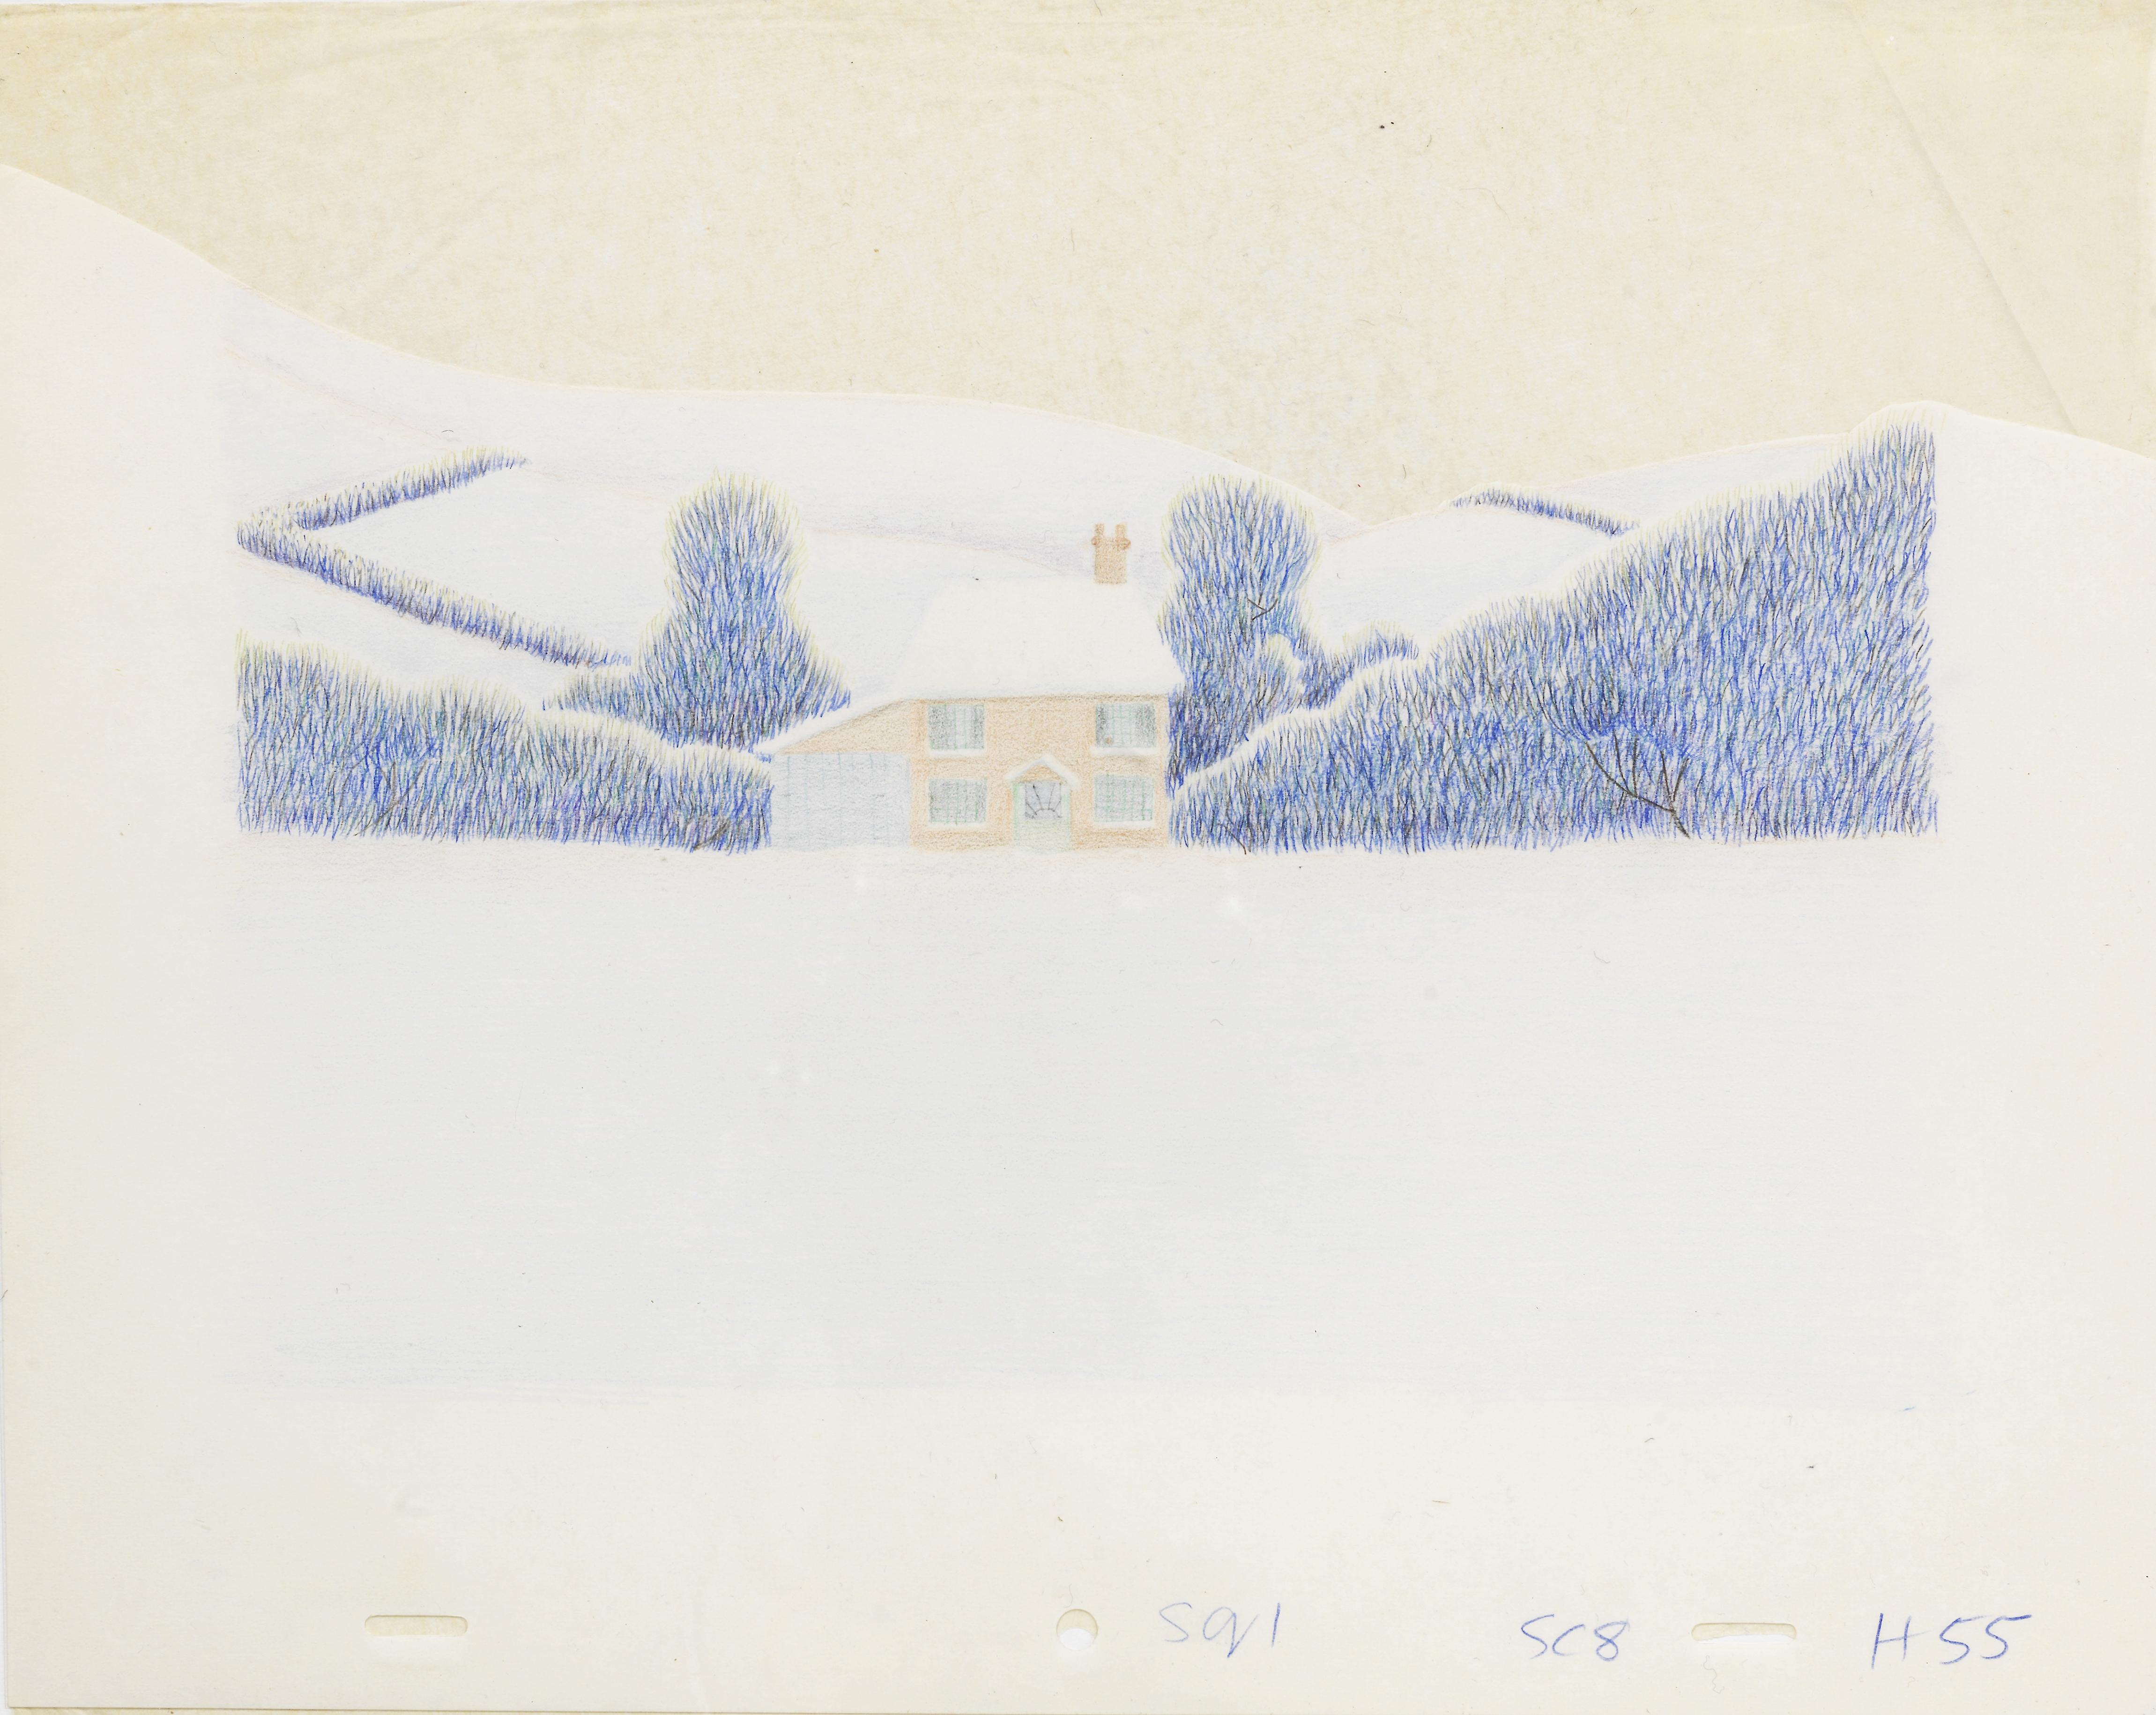 Lot 37 - The Snowman: an original animation backdrop cel of a winter scene, 1982,